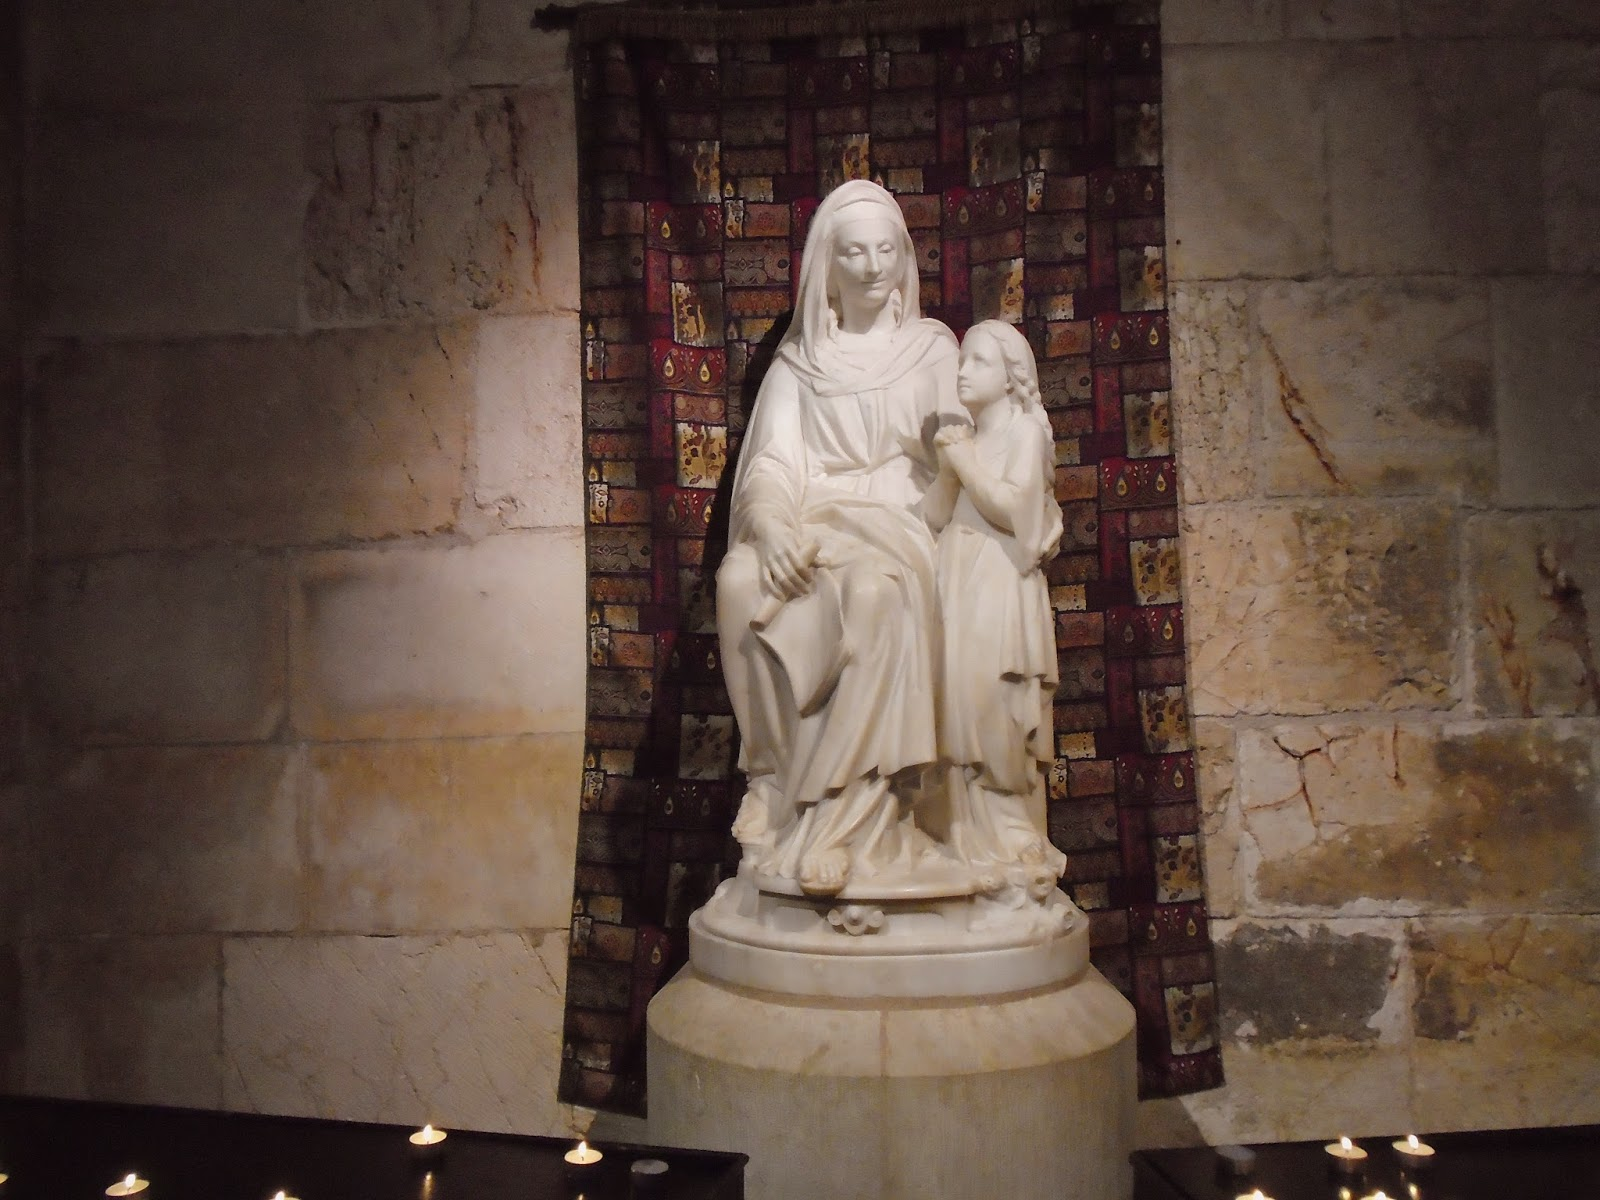 saint joachim muslim personals Joachim (/ ˈ dʒ oʊ ə k ɪ m / he whom yahweh has set up, hebrew: יְהוֹיָקִים  yəhôyāqîm, greek ἰωακείμ iōākeím) was the husband of saint anne and the father of mary, the mother of jesus, according to the catholic, orthodox, and anglican traditions.